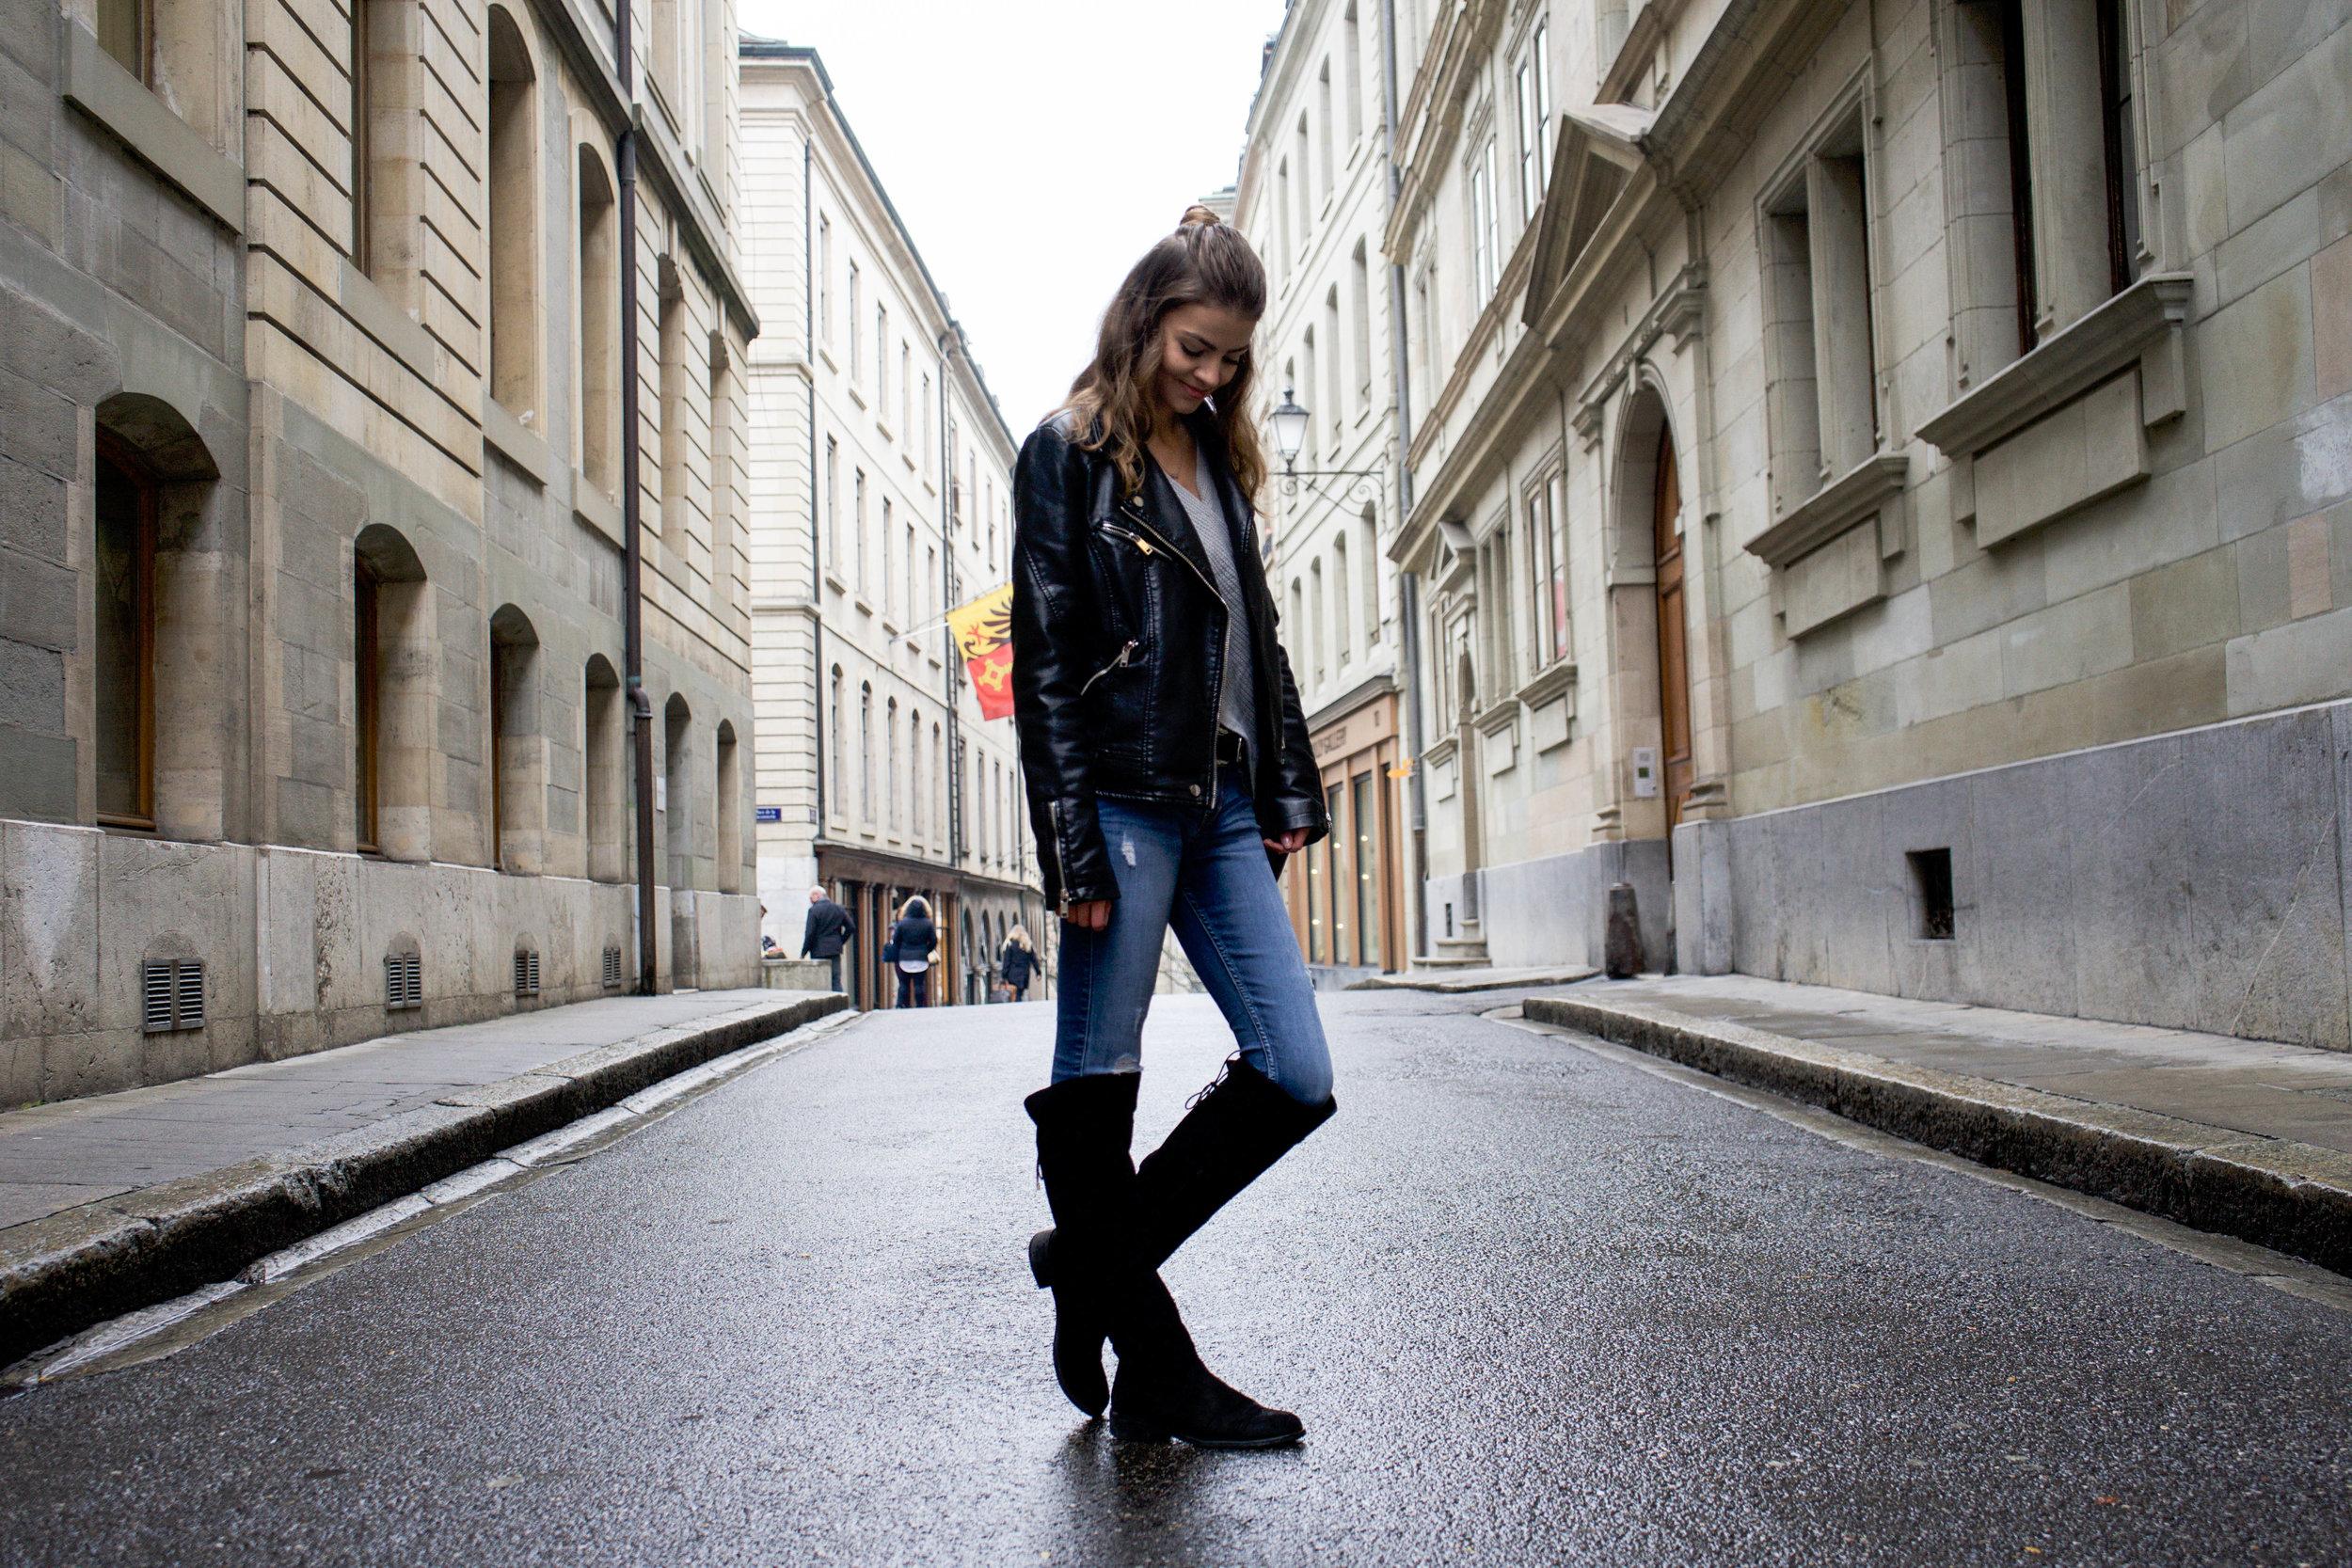 Profil all outfit tête baissée_.jpg